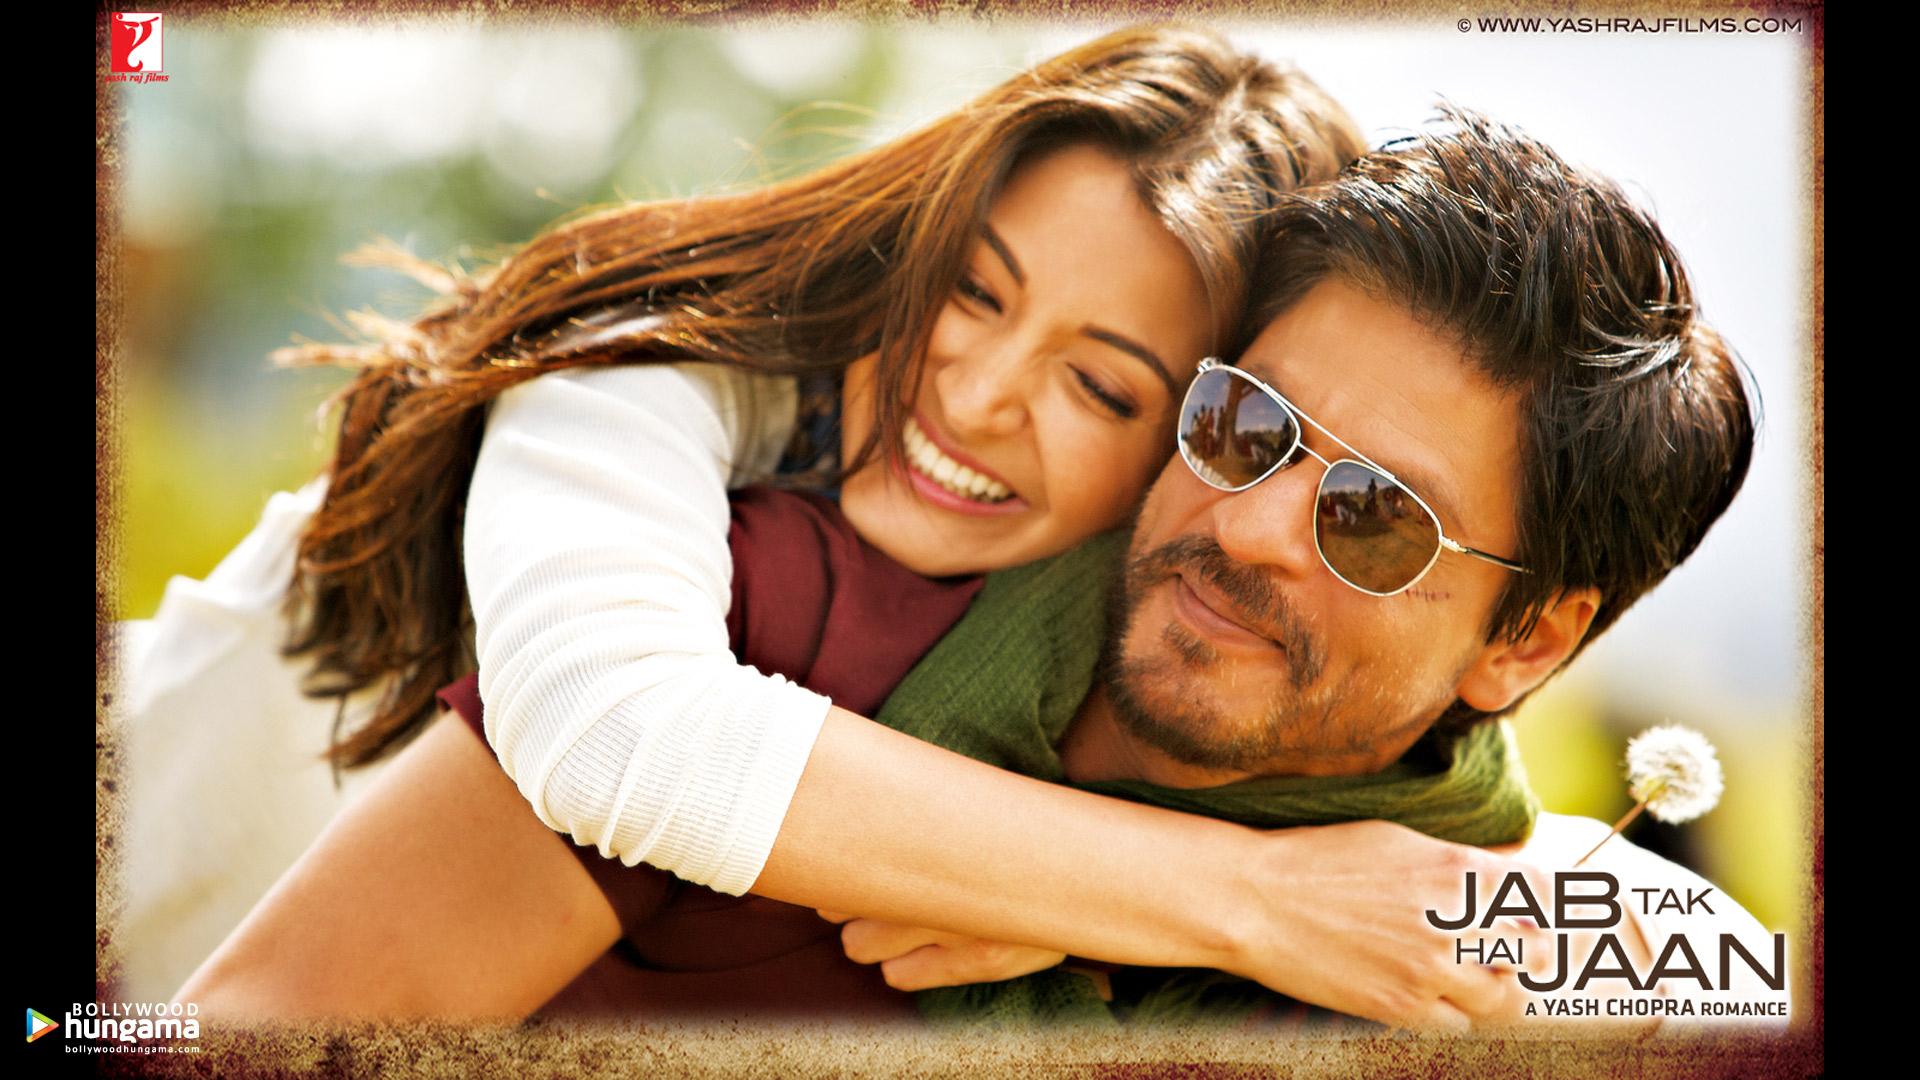 Jab Tak Hai Jaan full movie in hindi dubbed download movies